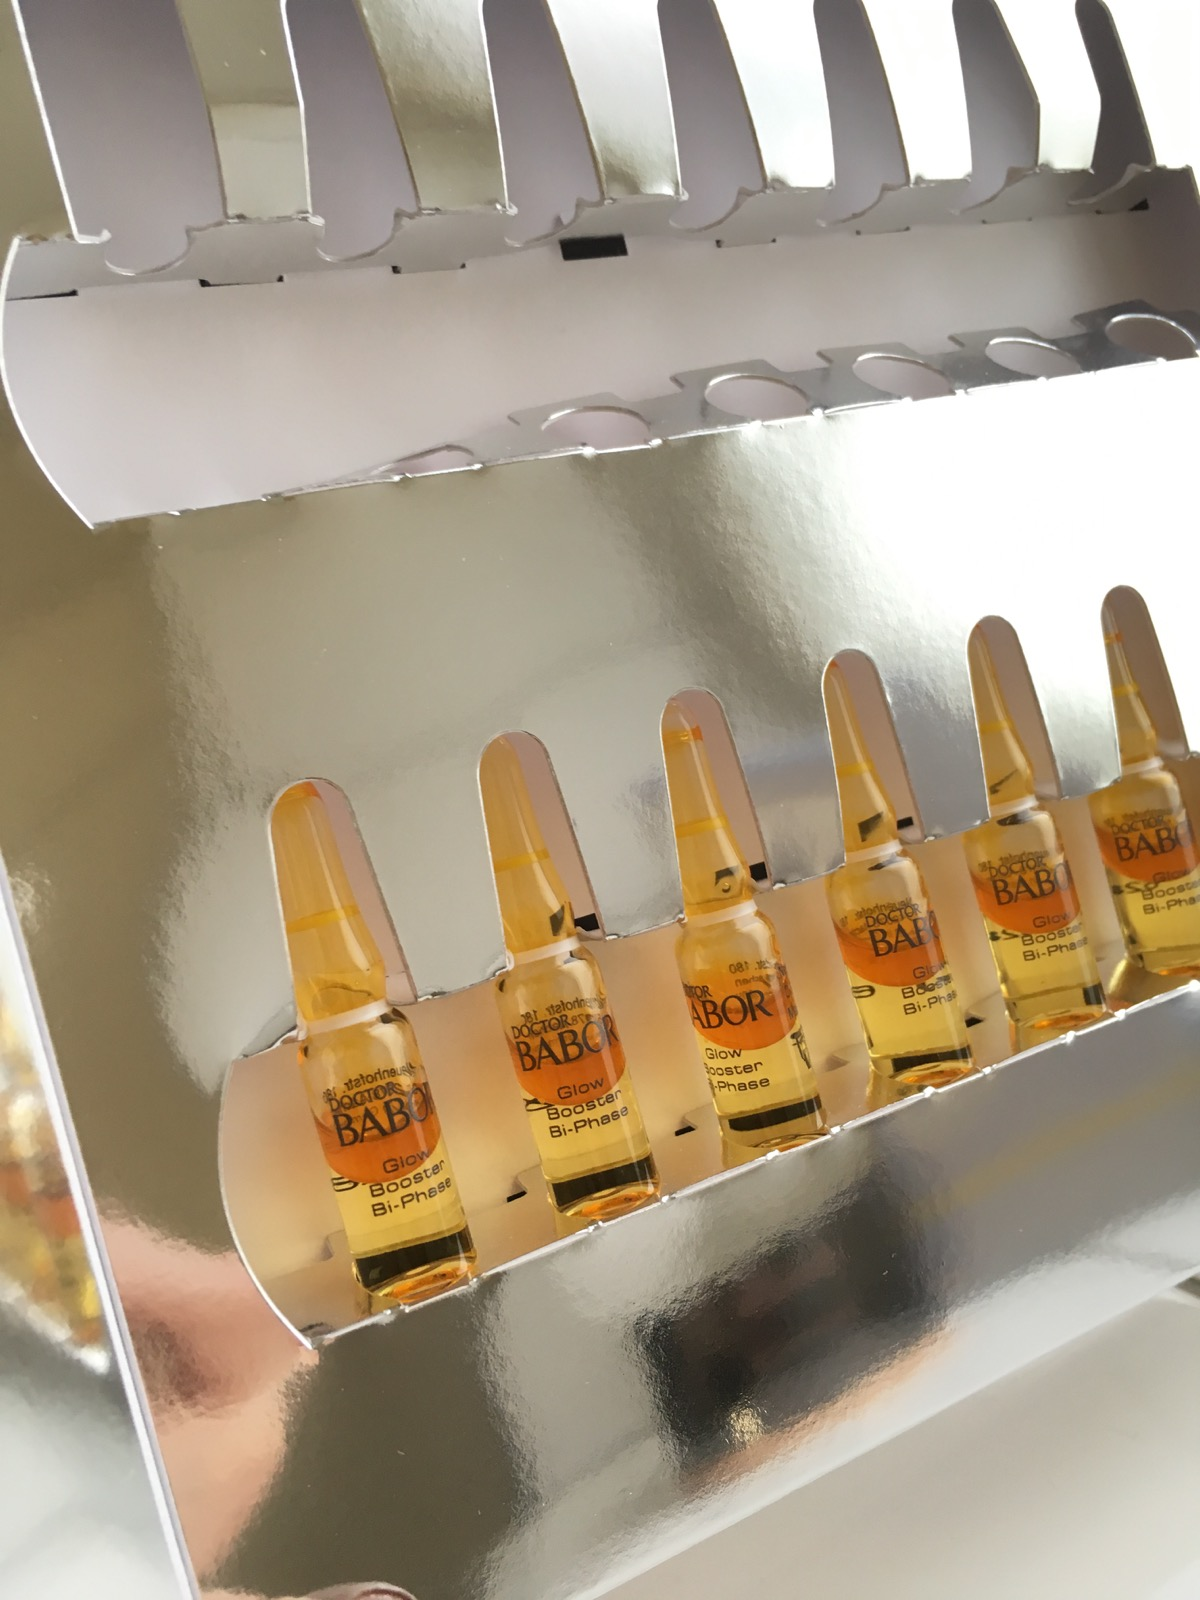 dr babor ampoules glow open|skonhetssnack.se